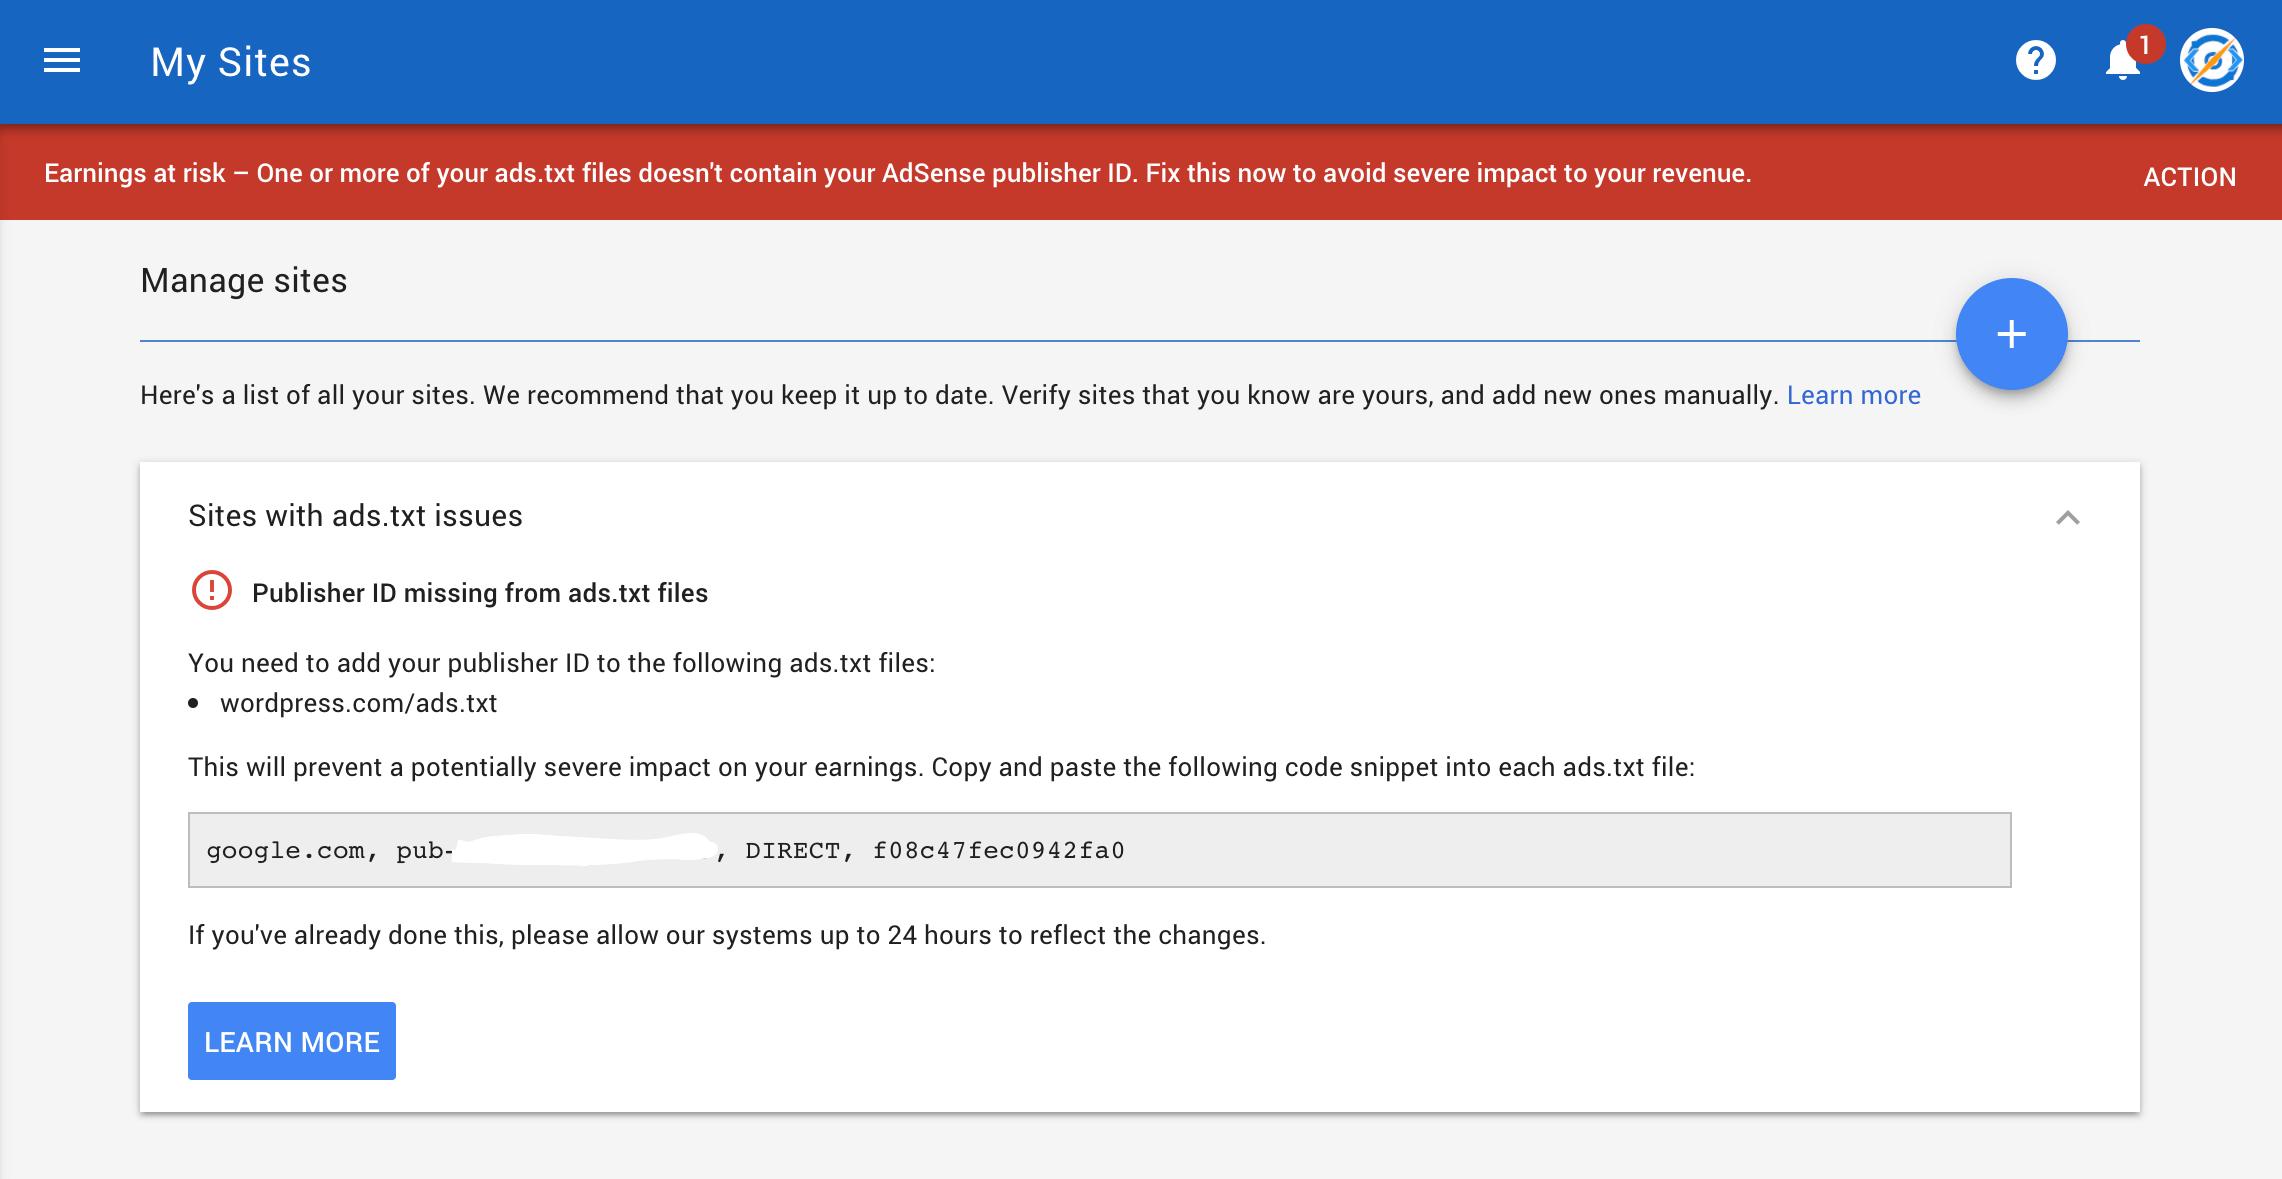 How to Fix ads txt error message on Google AdSense account